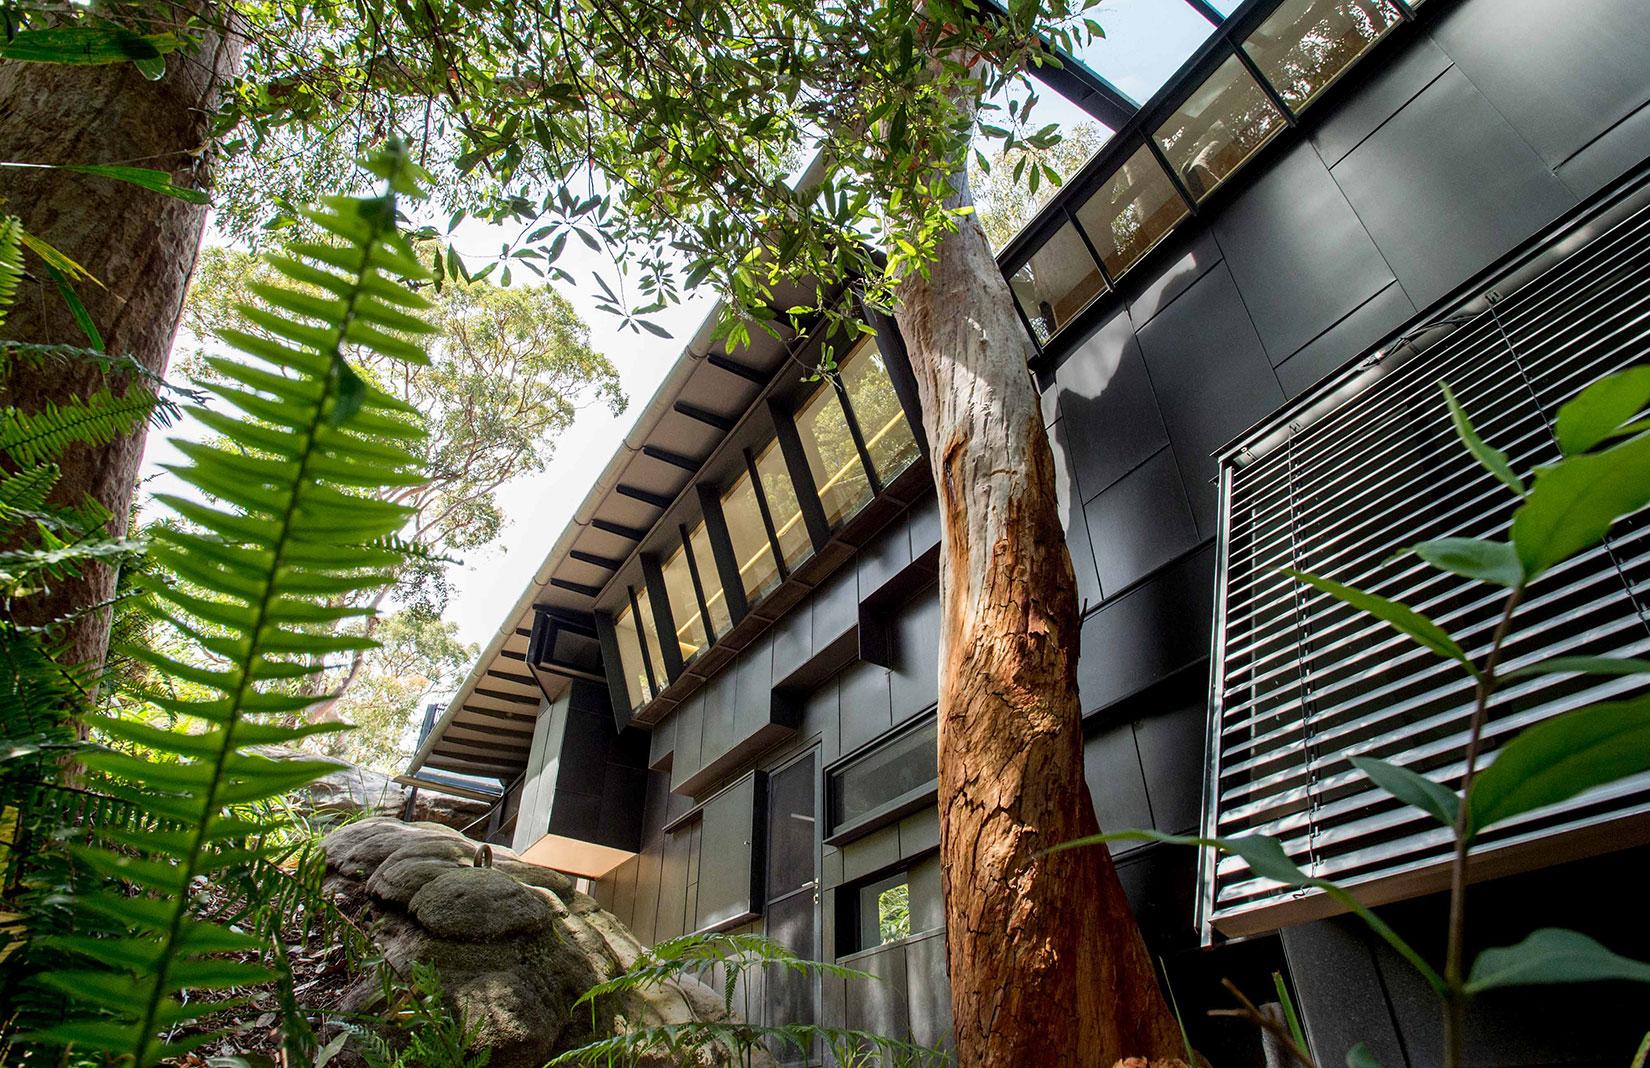 Sydney property Donaldson House, designed by Glenn Murcutt